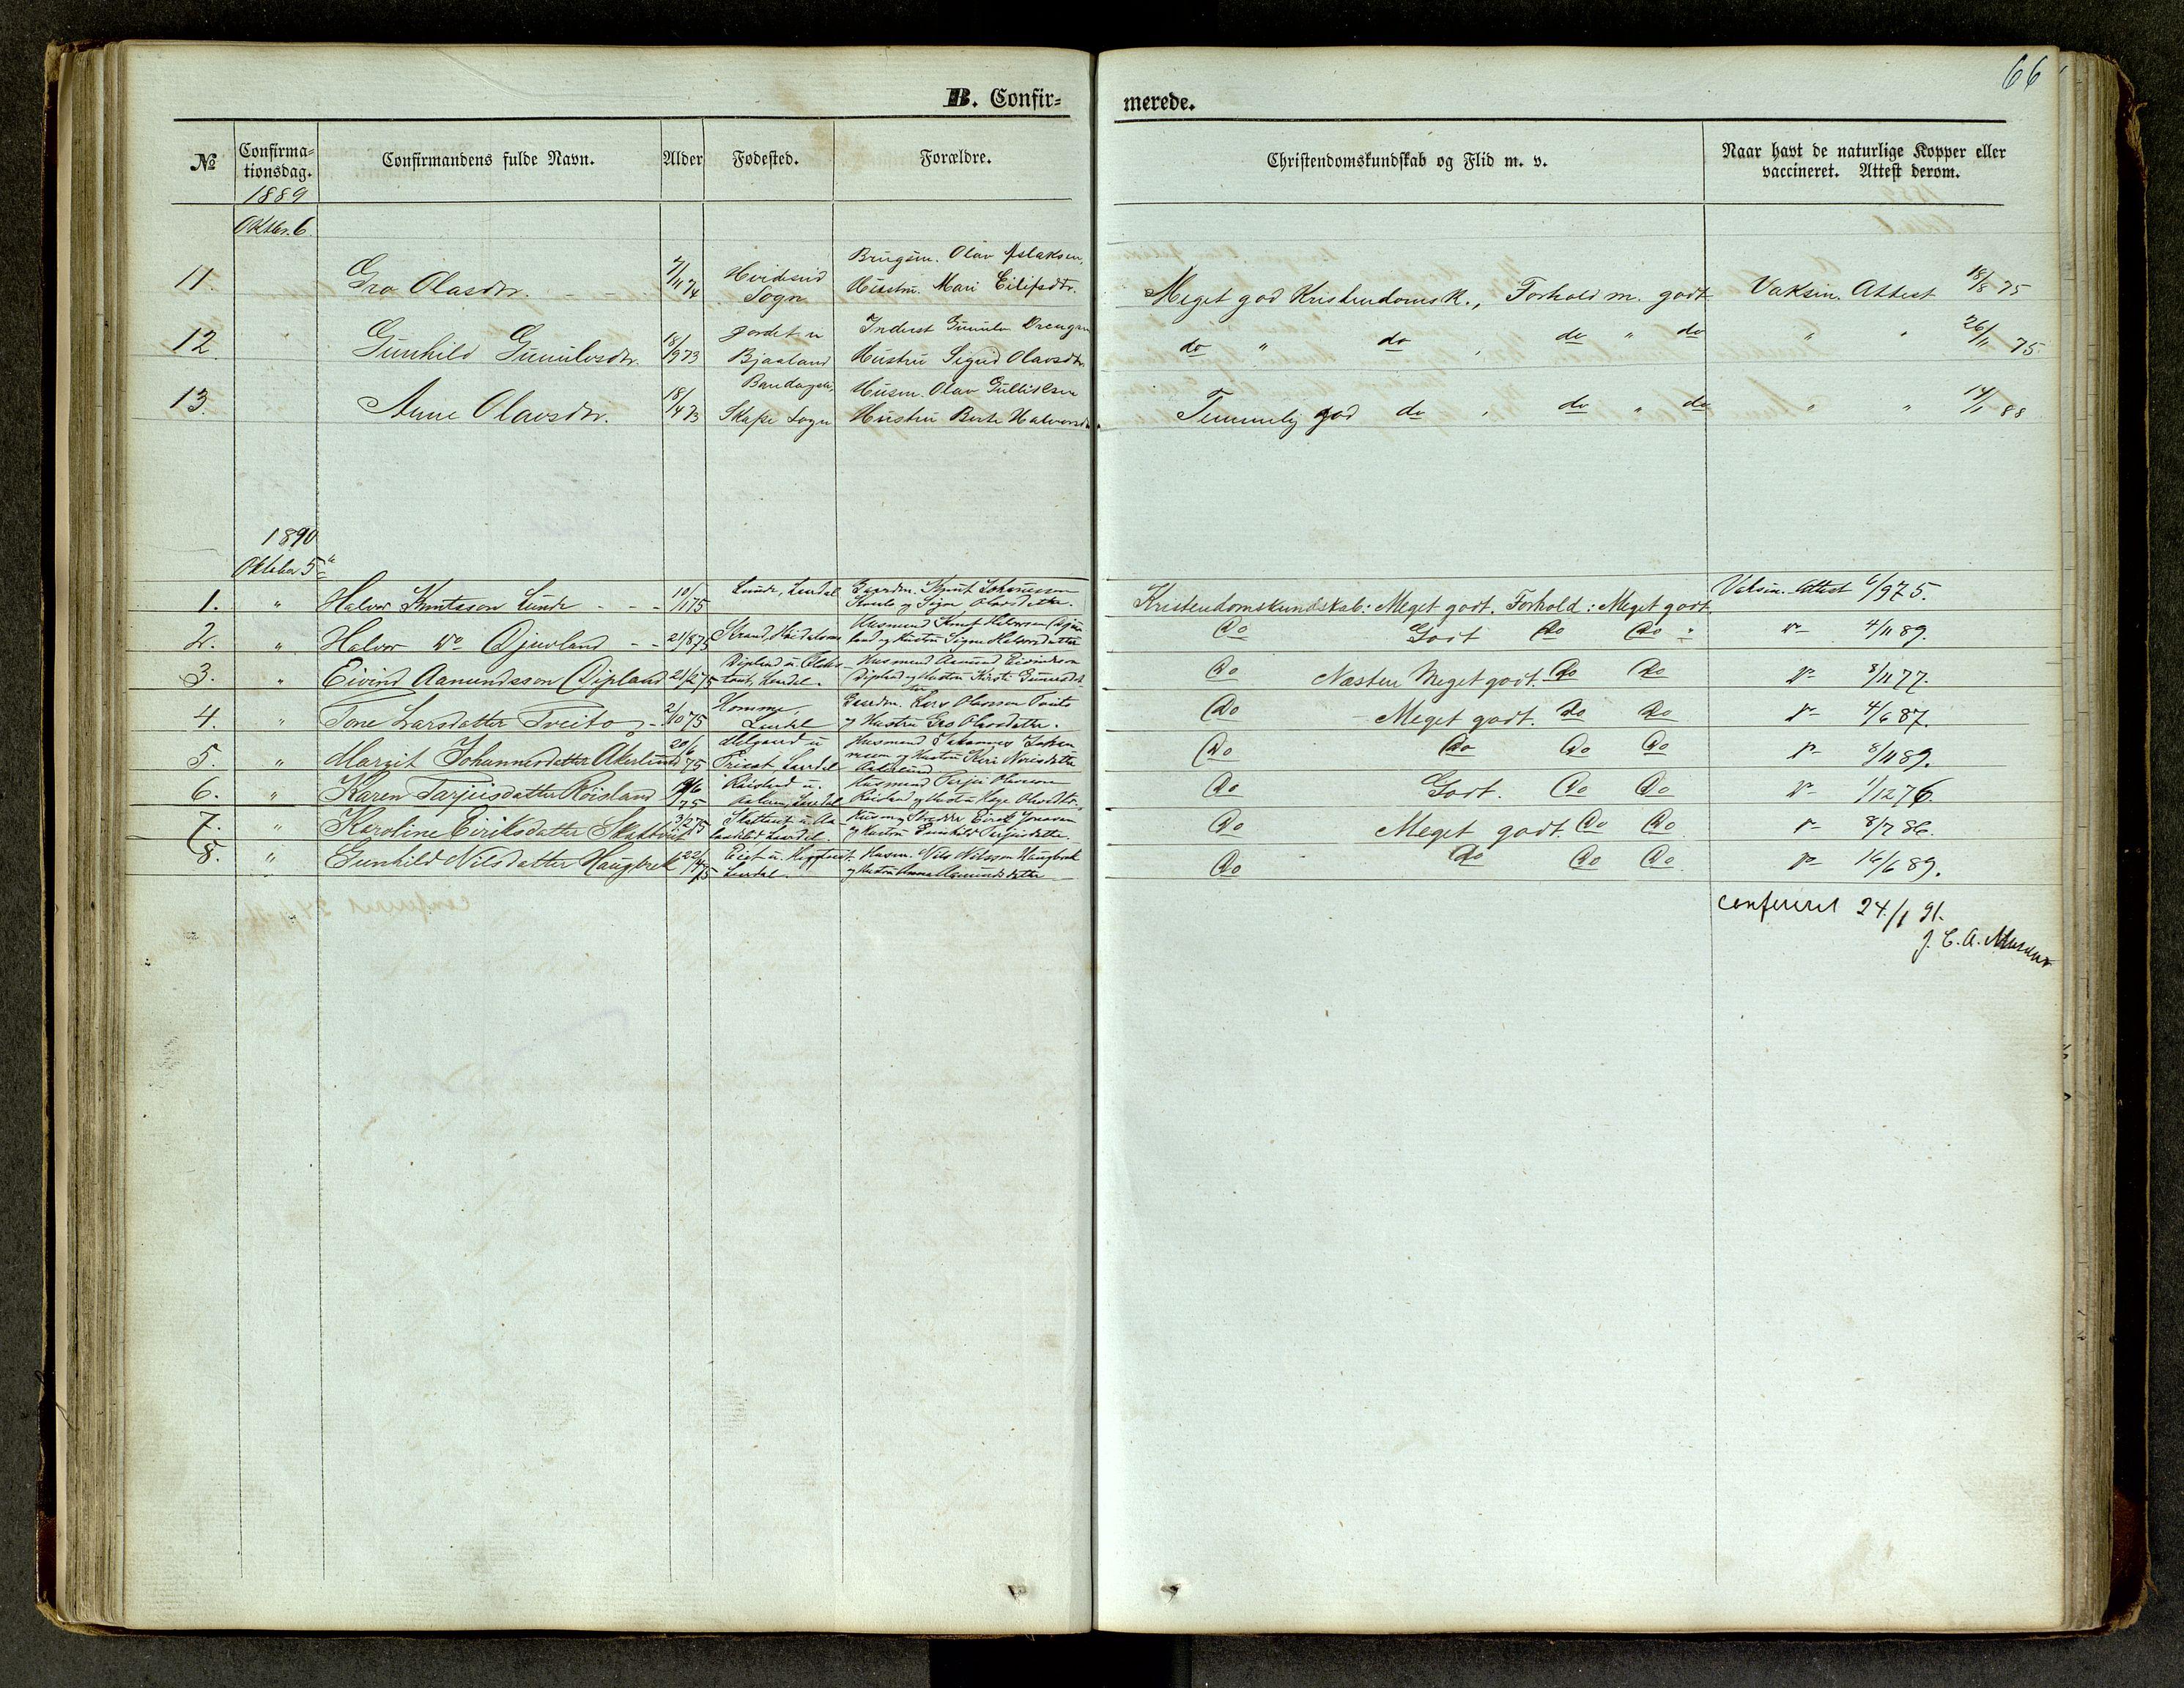 SAKO, Lårdal kirkebøker, G/Ga/L0002: Klokkerbok nr. I 2, 1861-1890, s. 66